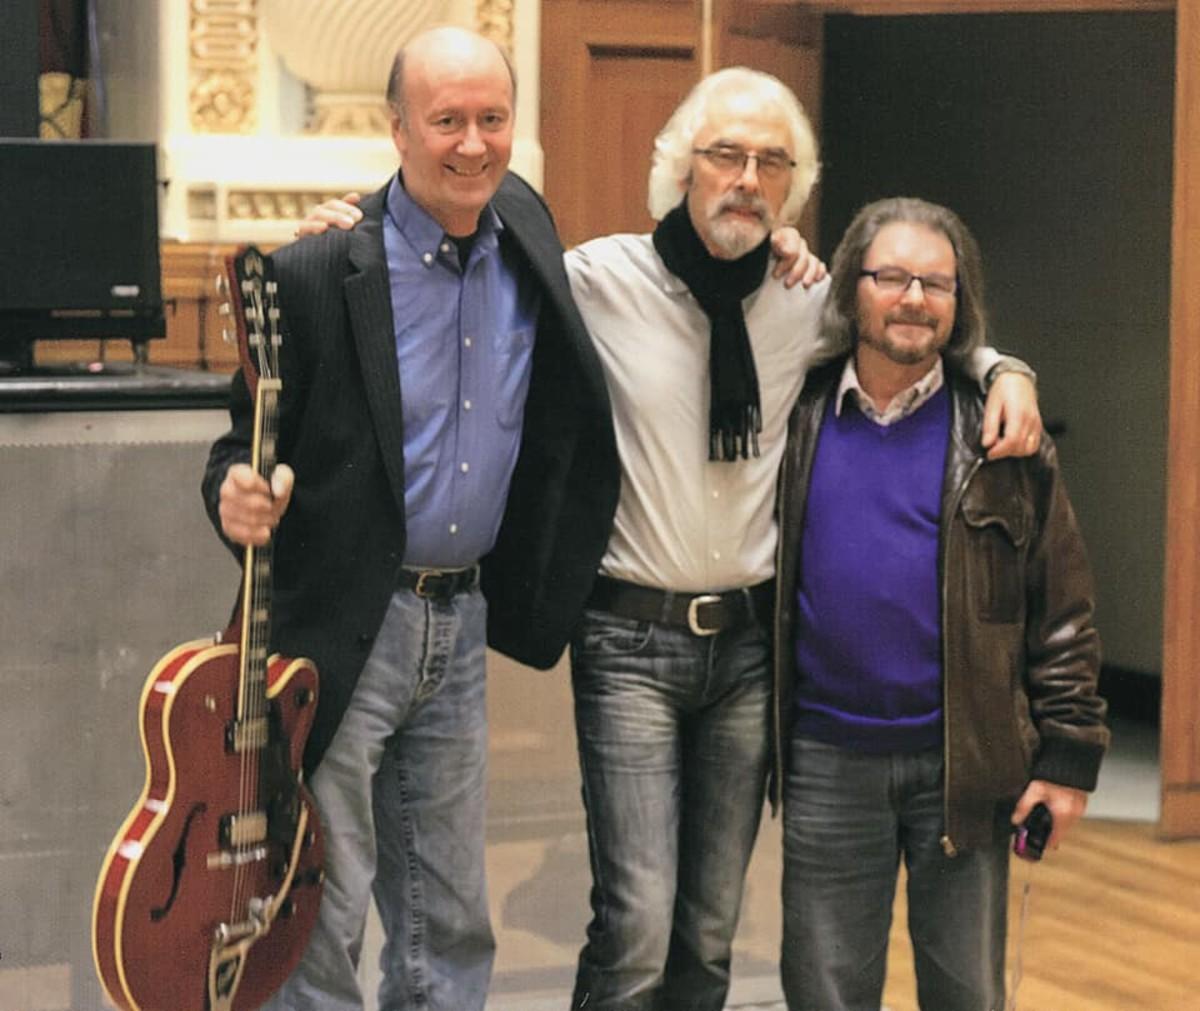 A few of the band members in a more current photo. (L-R): Eddy Pumer, Peter Daltrey and Dan Bridgman.